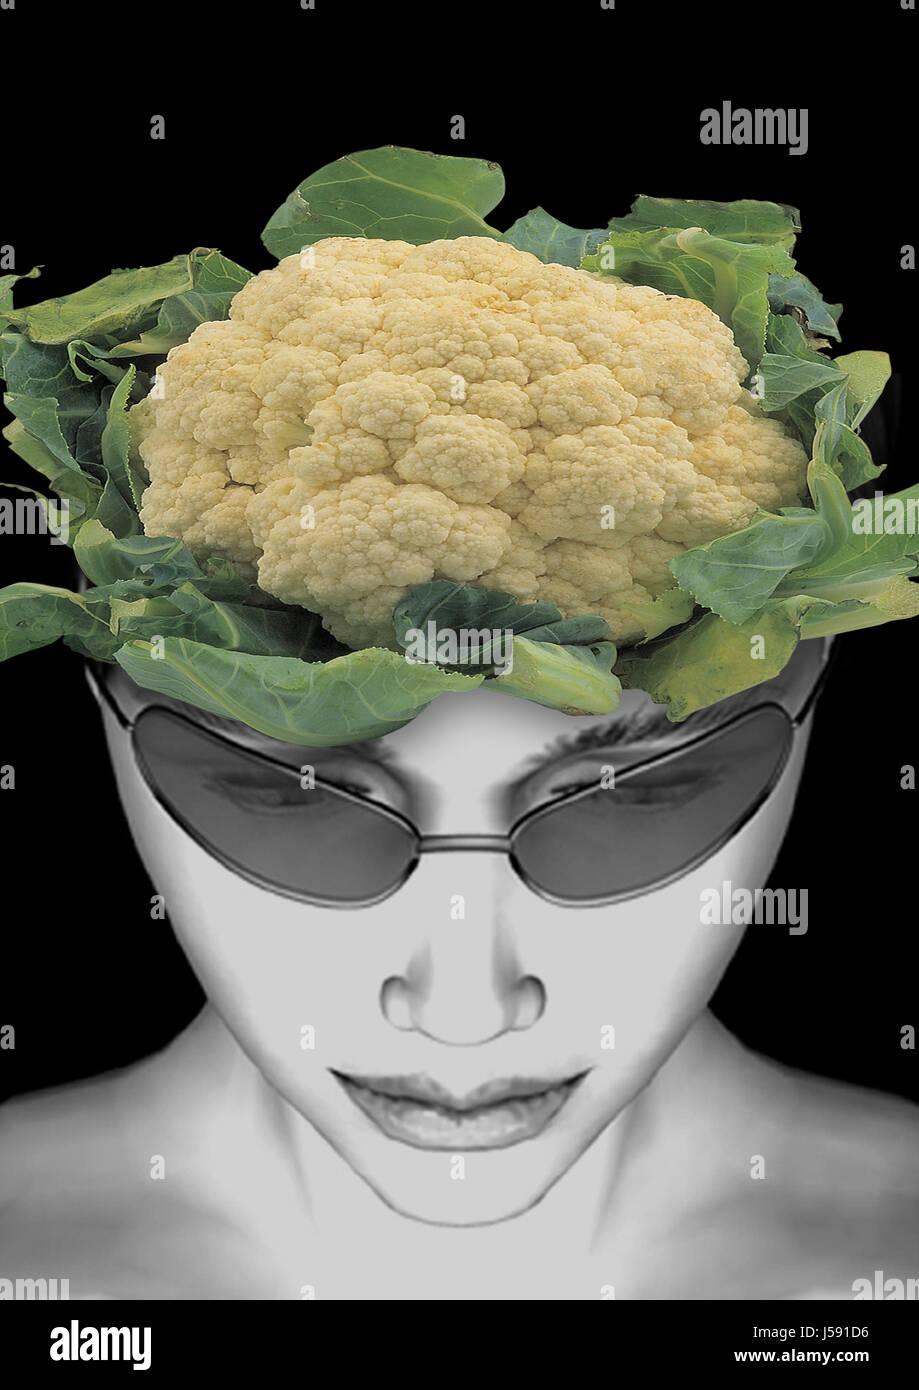 woman,face,memories,cauliflower,memory,brain,head,memory Stock Photo